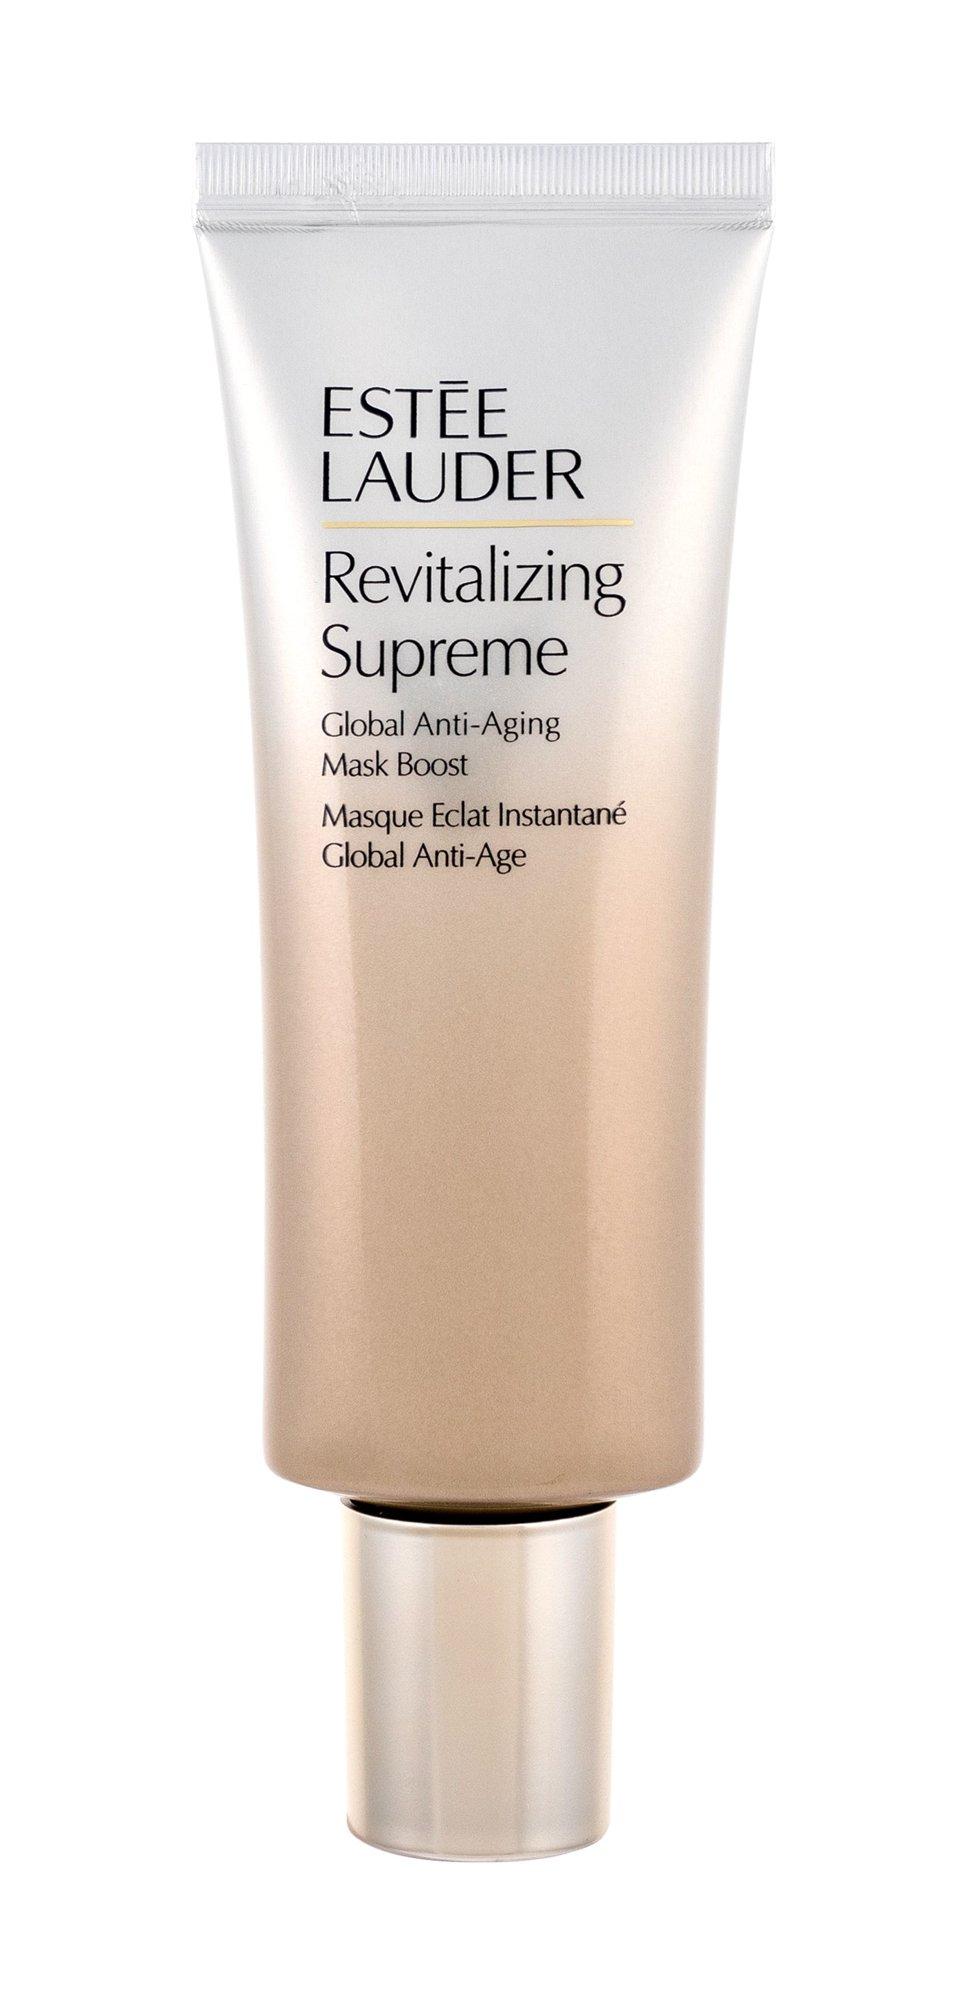 Estée Lauder Revitalizing Supreme Face Mask 75ml